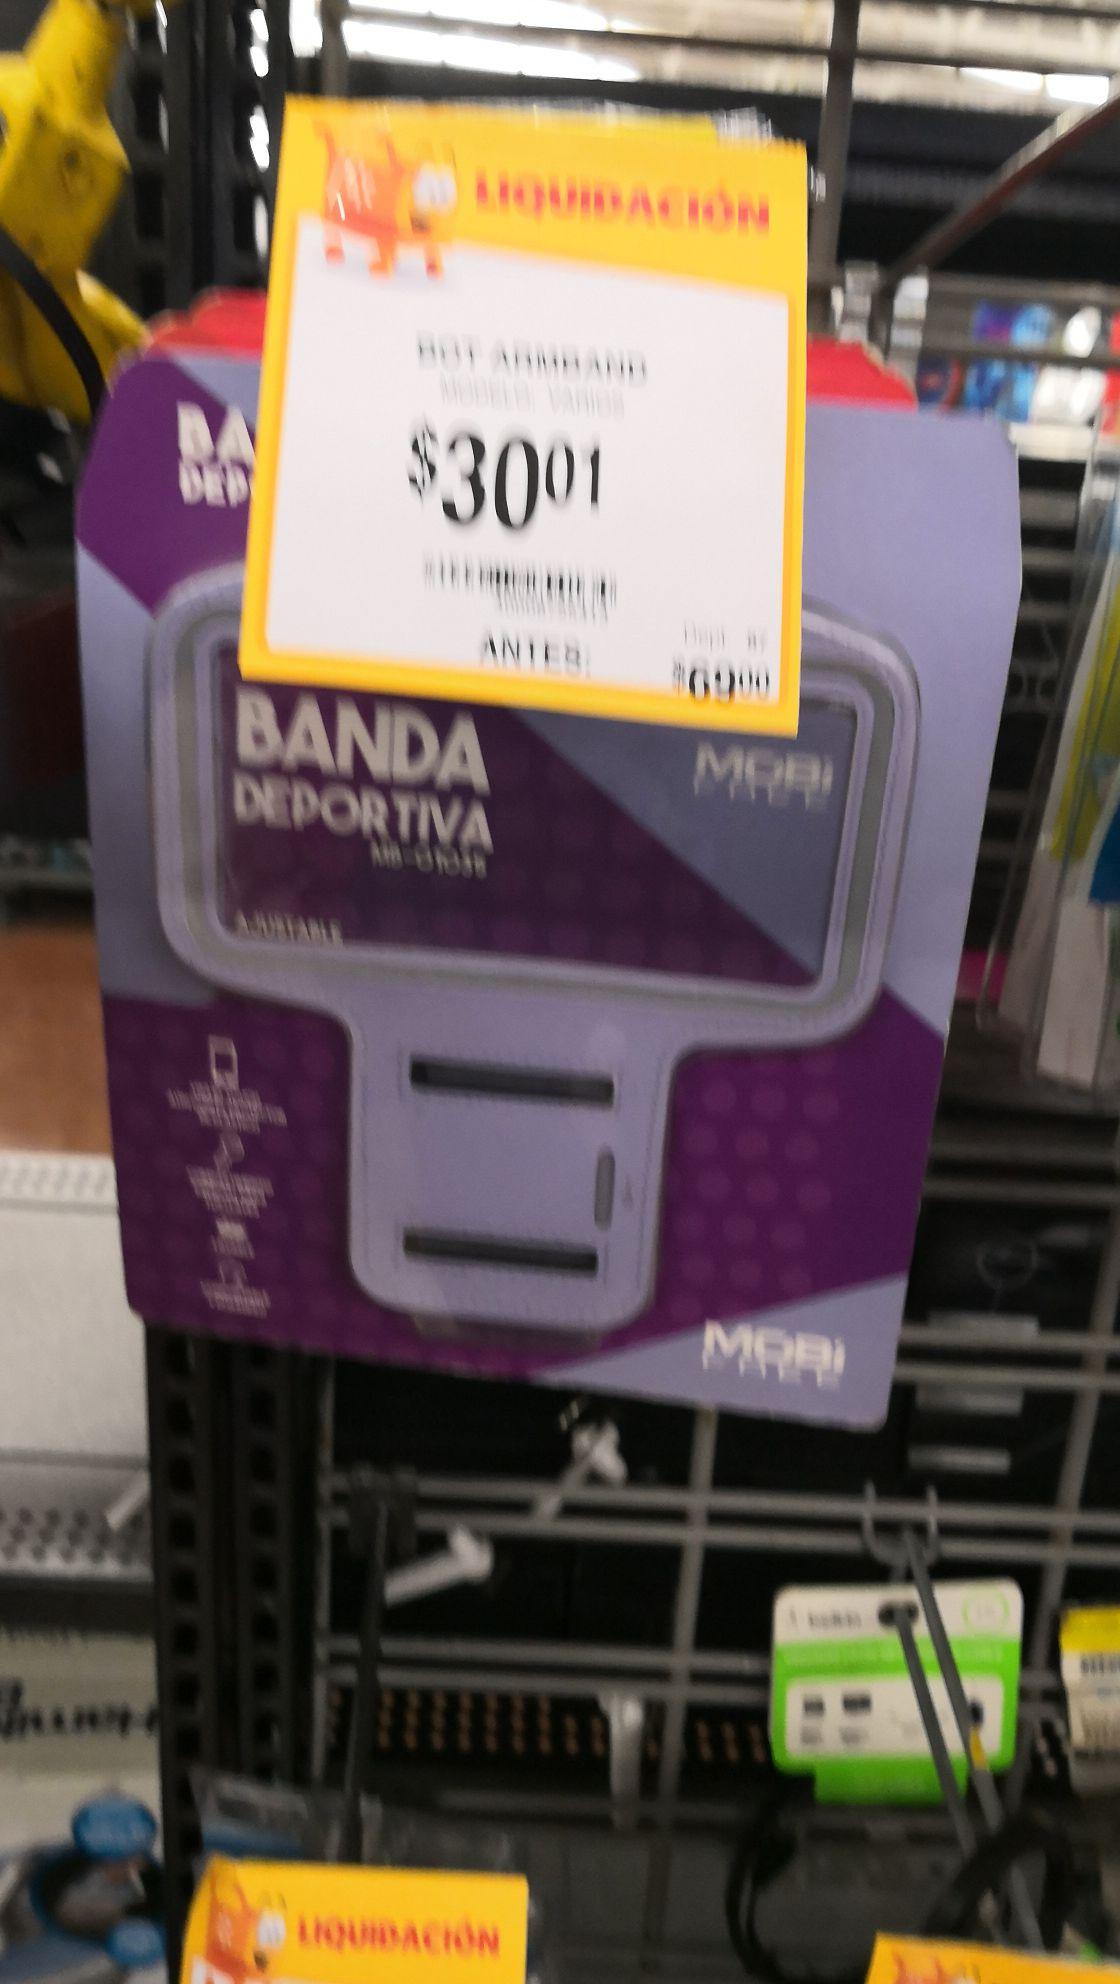 Walmart: Banda porta celular a $30.01